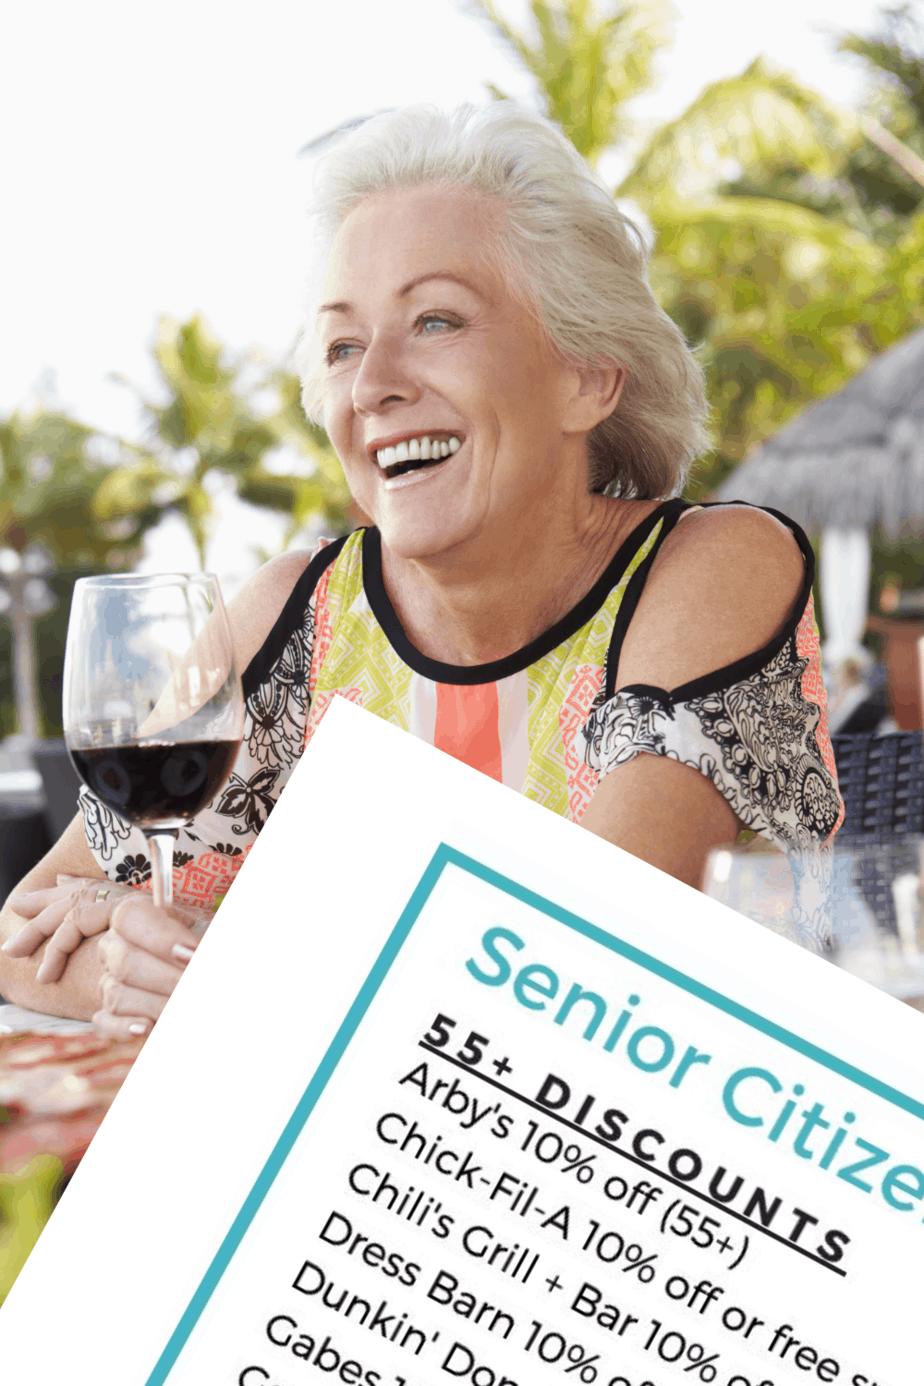 Senior Citizen Discounts in Frederick Md